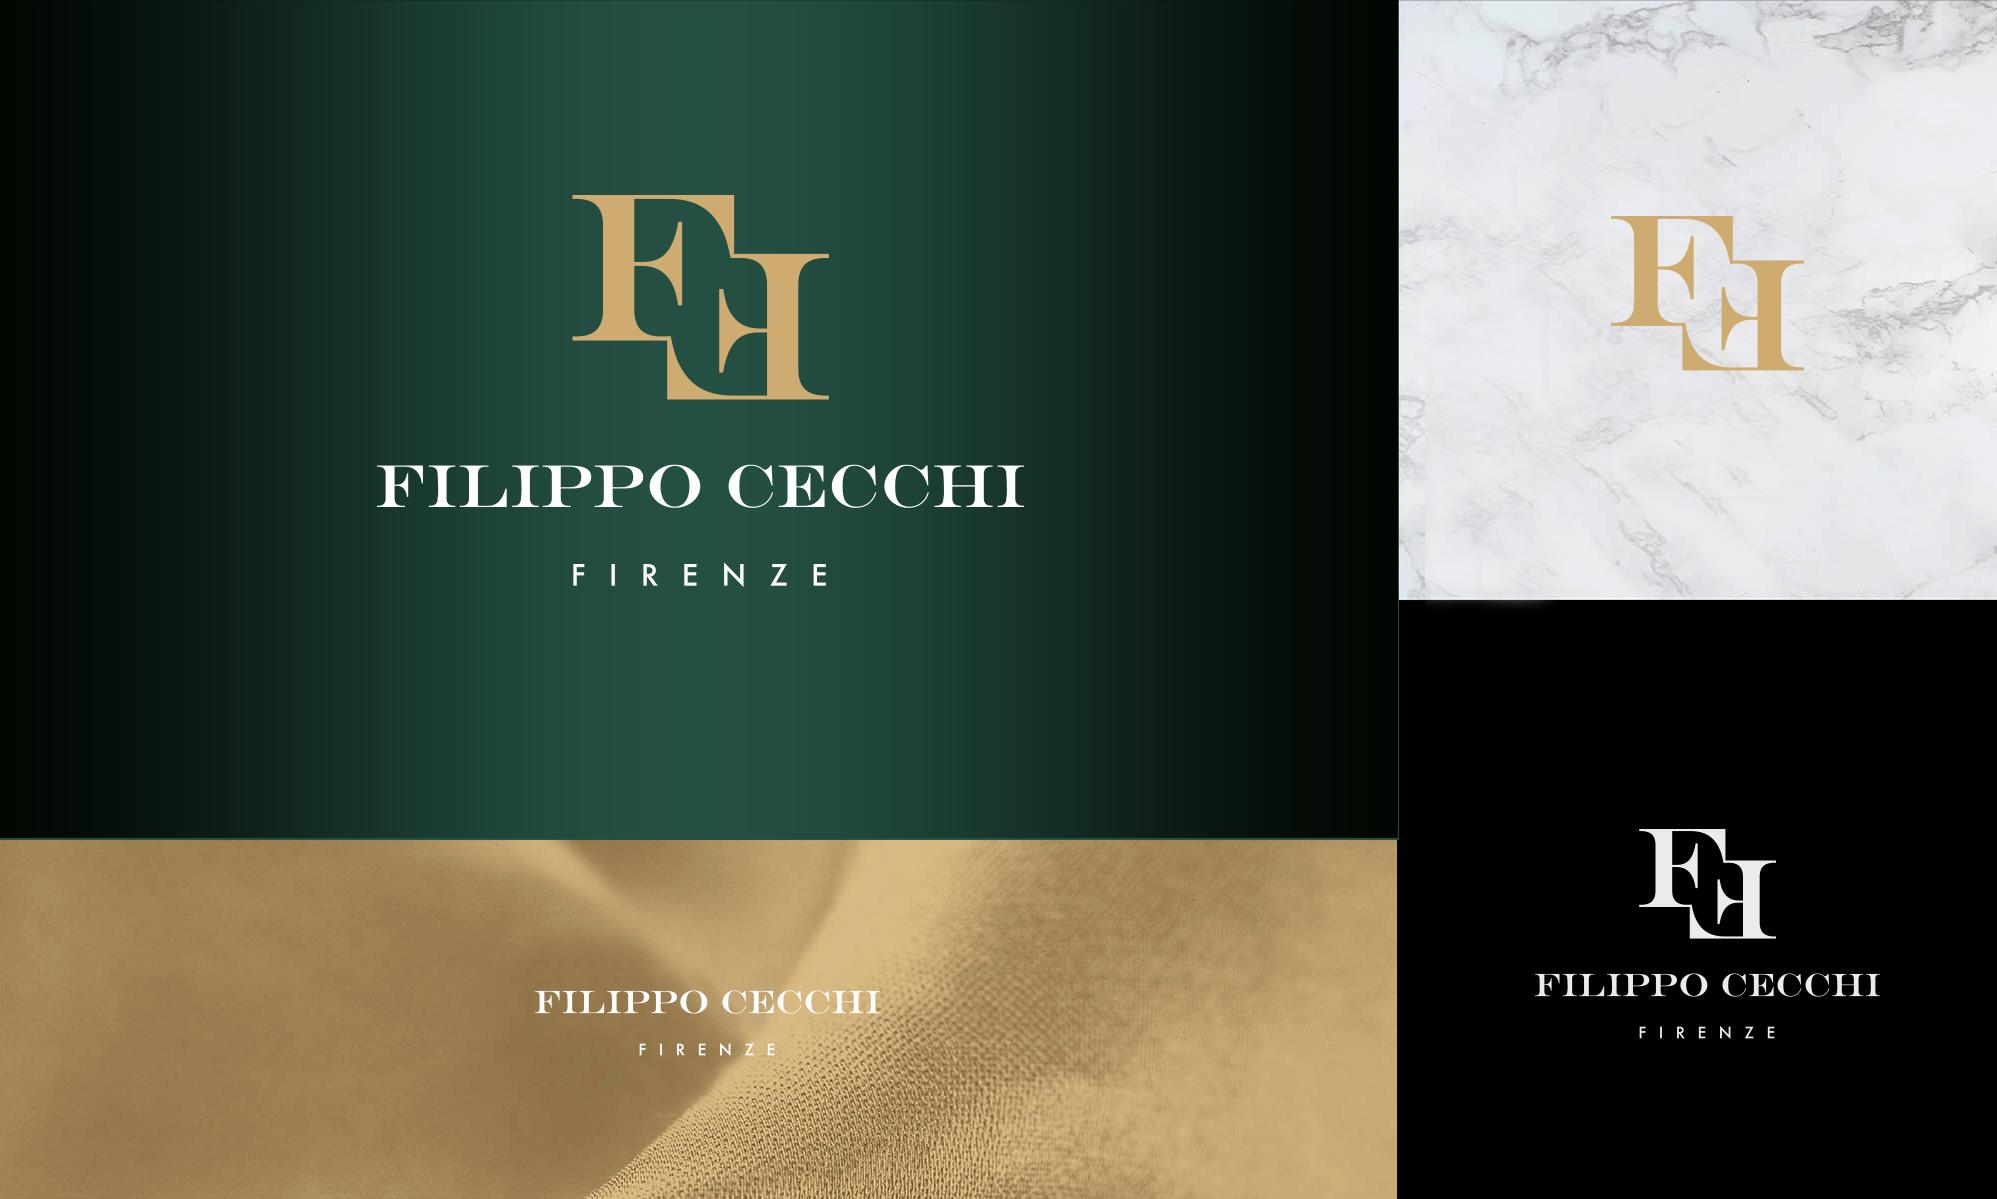 brendit_filippocecchi_brand